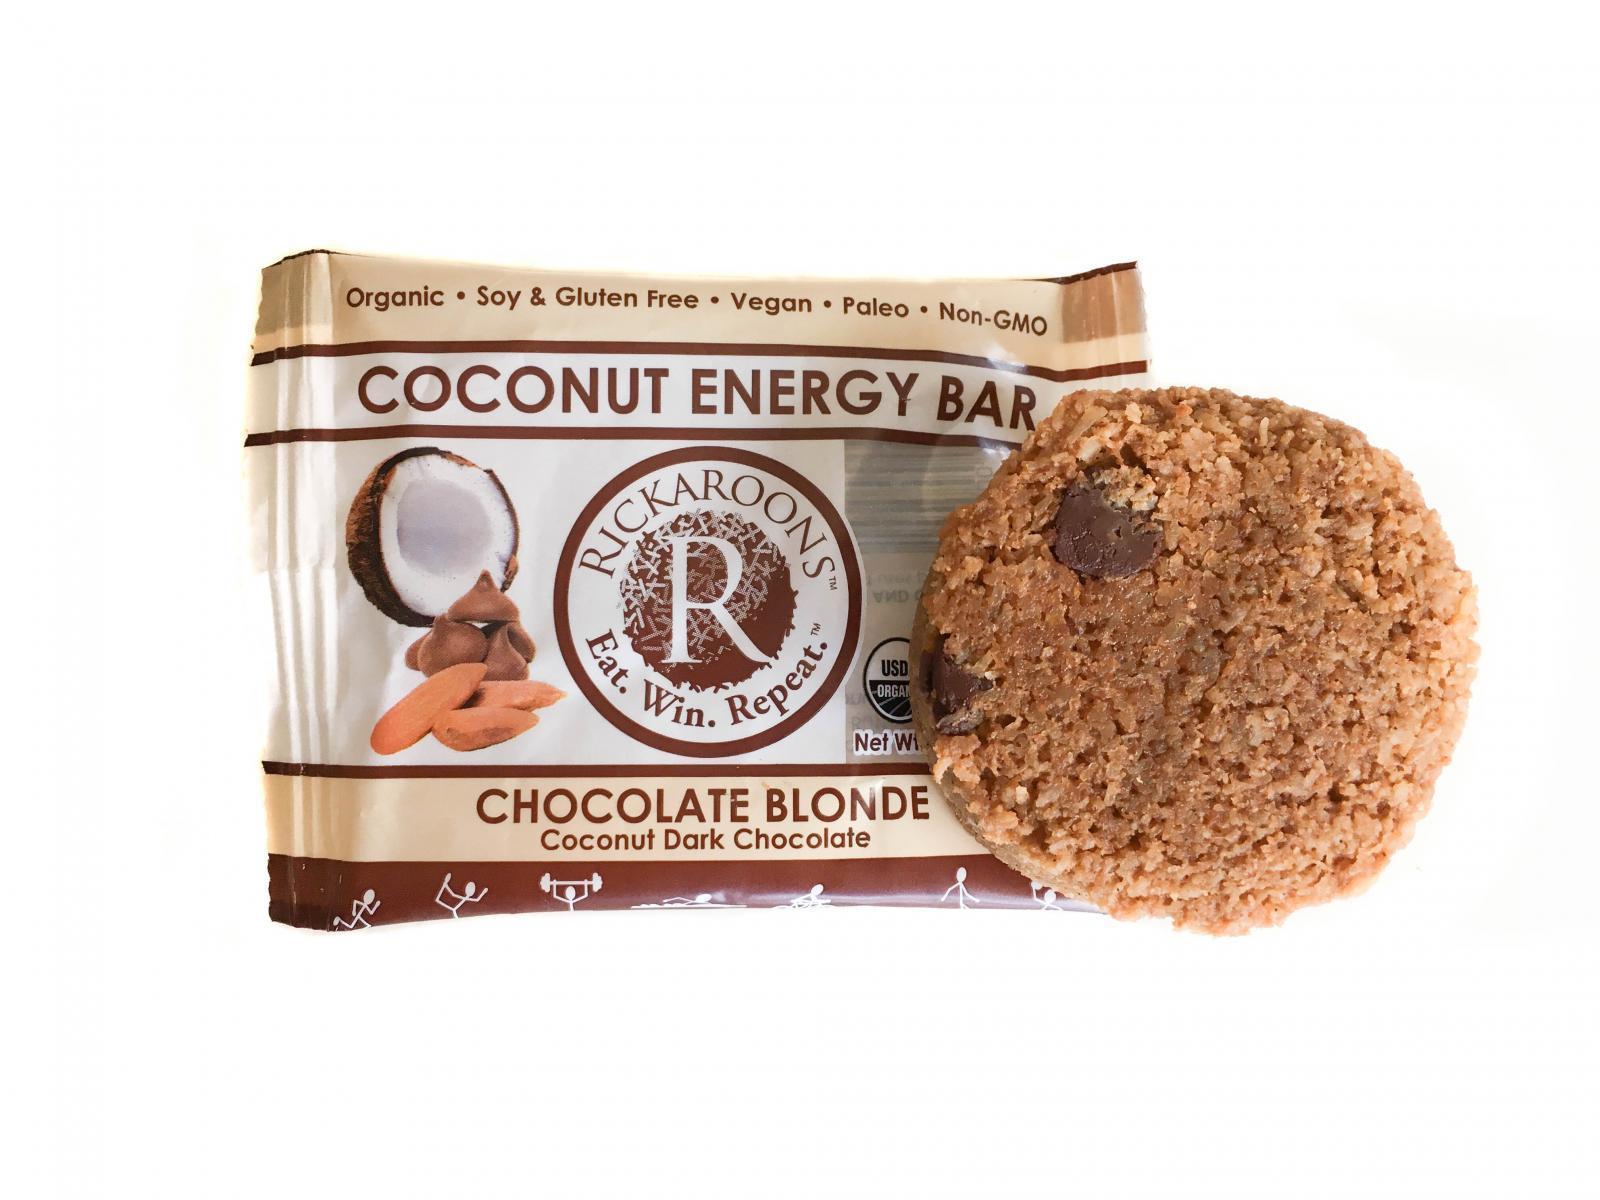 Chocolate Blonde - Coconut Chocolate Chip